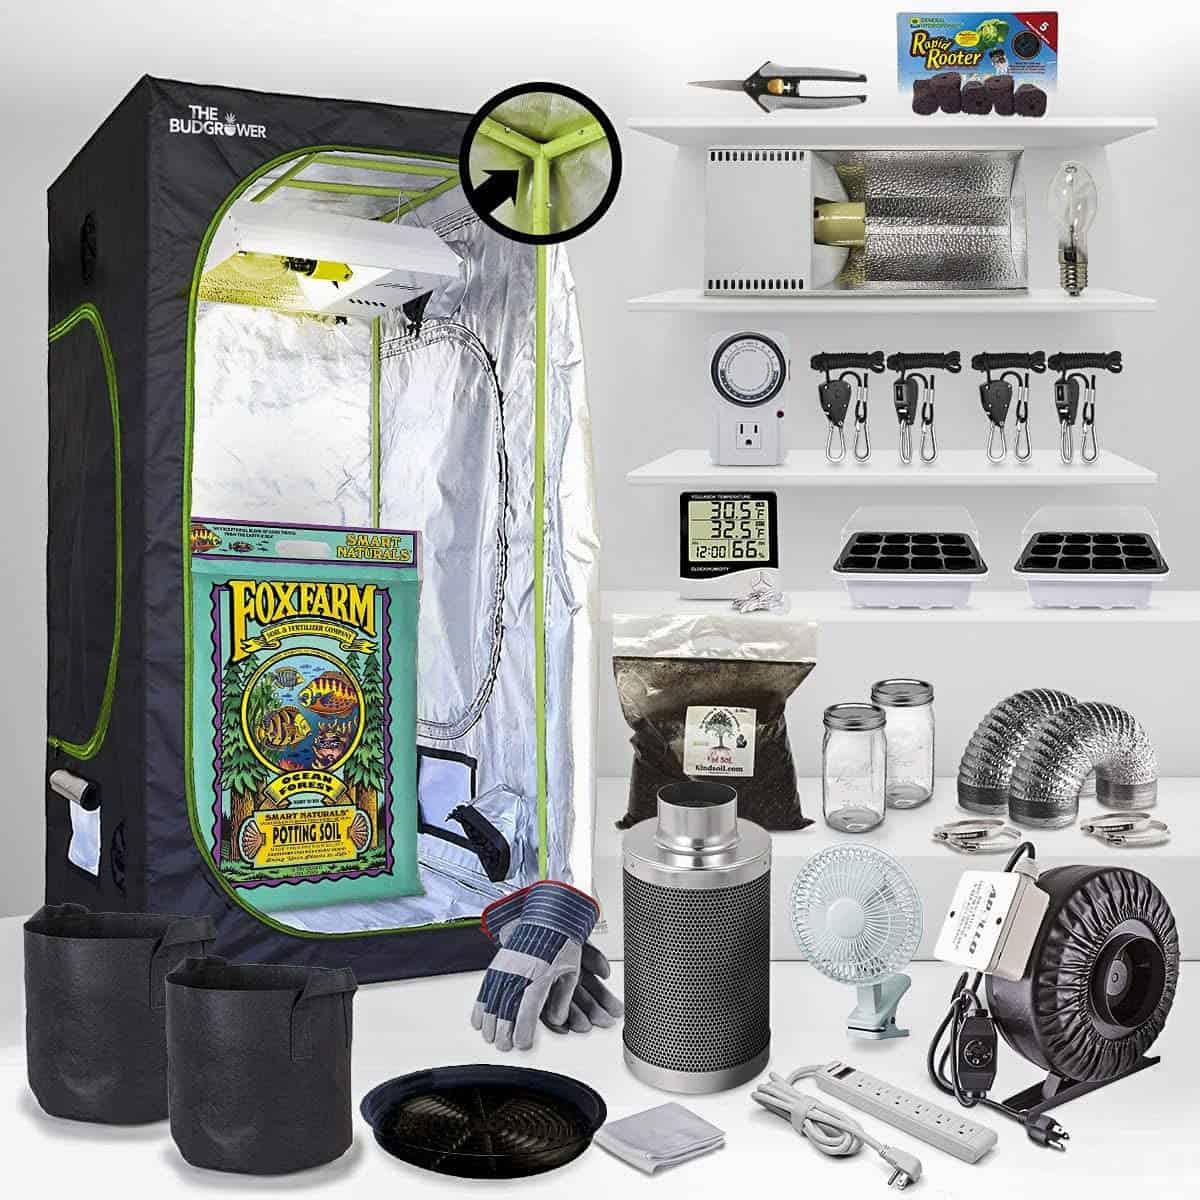 The Bud Grower Complete Indoor Grow Kit